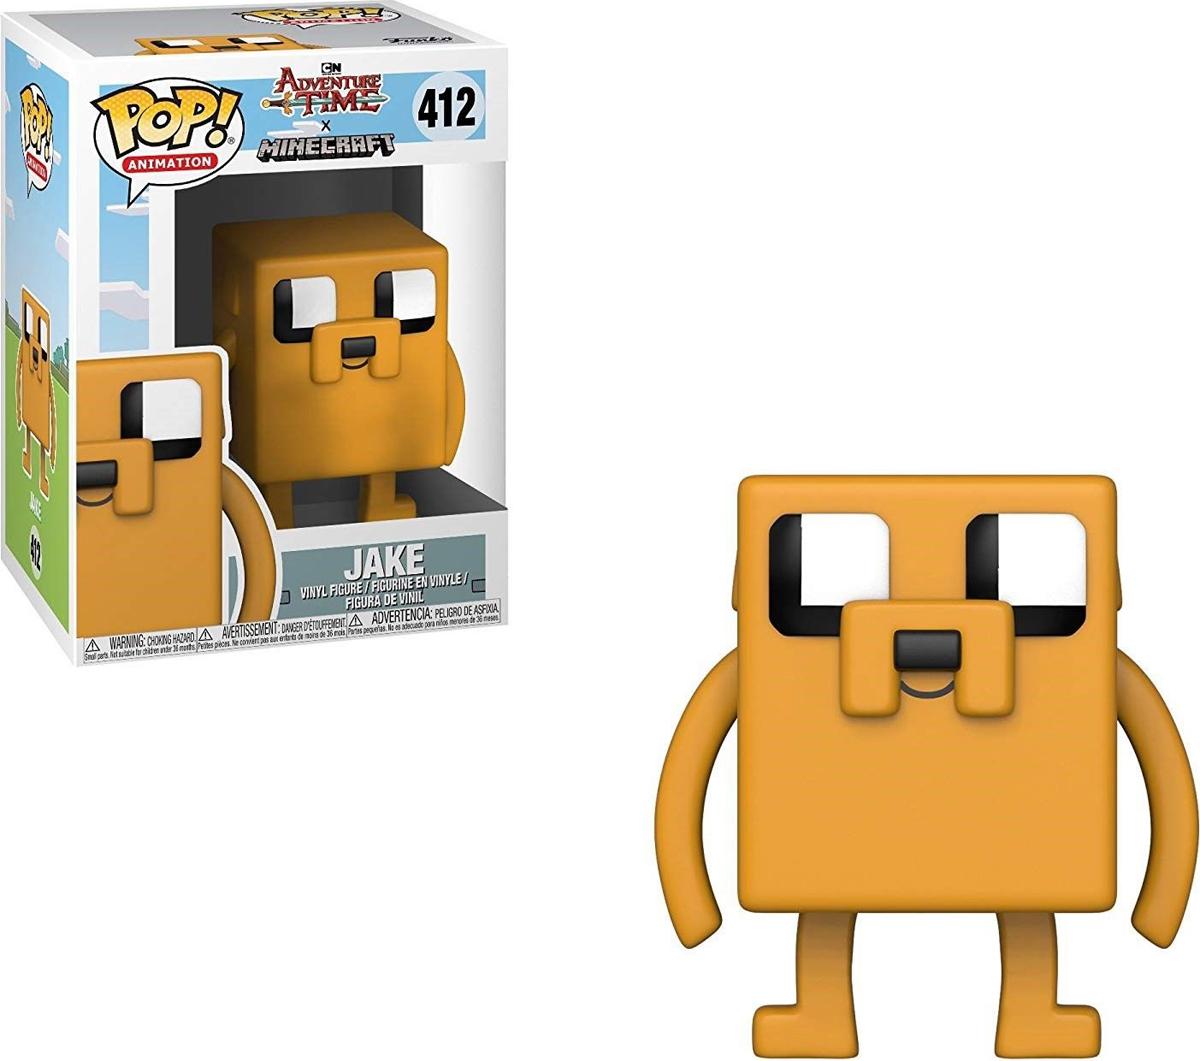 Фигурка Funko POP! Vinyl: Adventure Time/Minecraft S1: Jake 32238 фигурка funko pop vinyl yu gi oh s1 yami yugi 27448